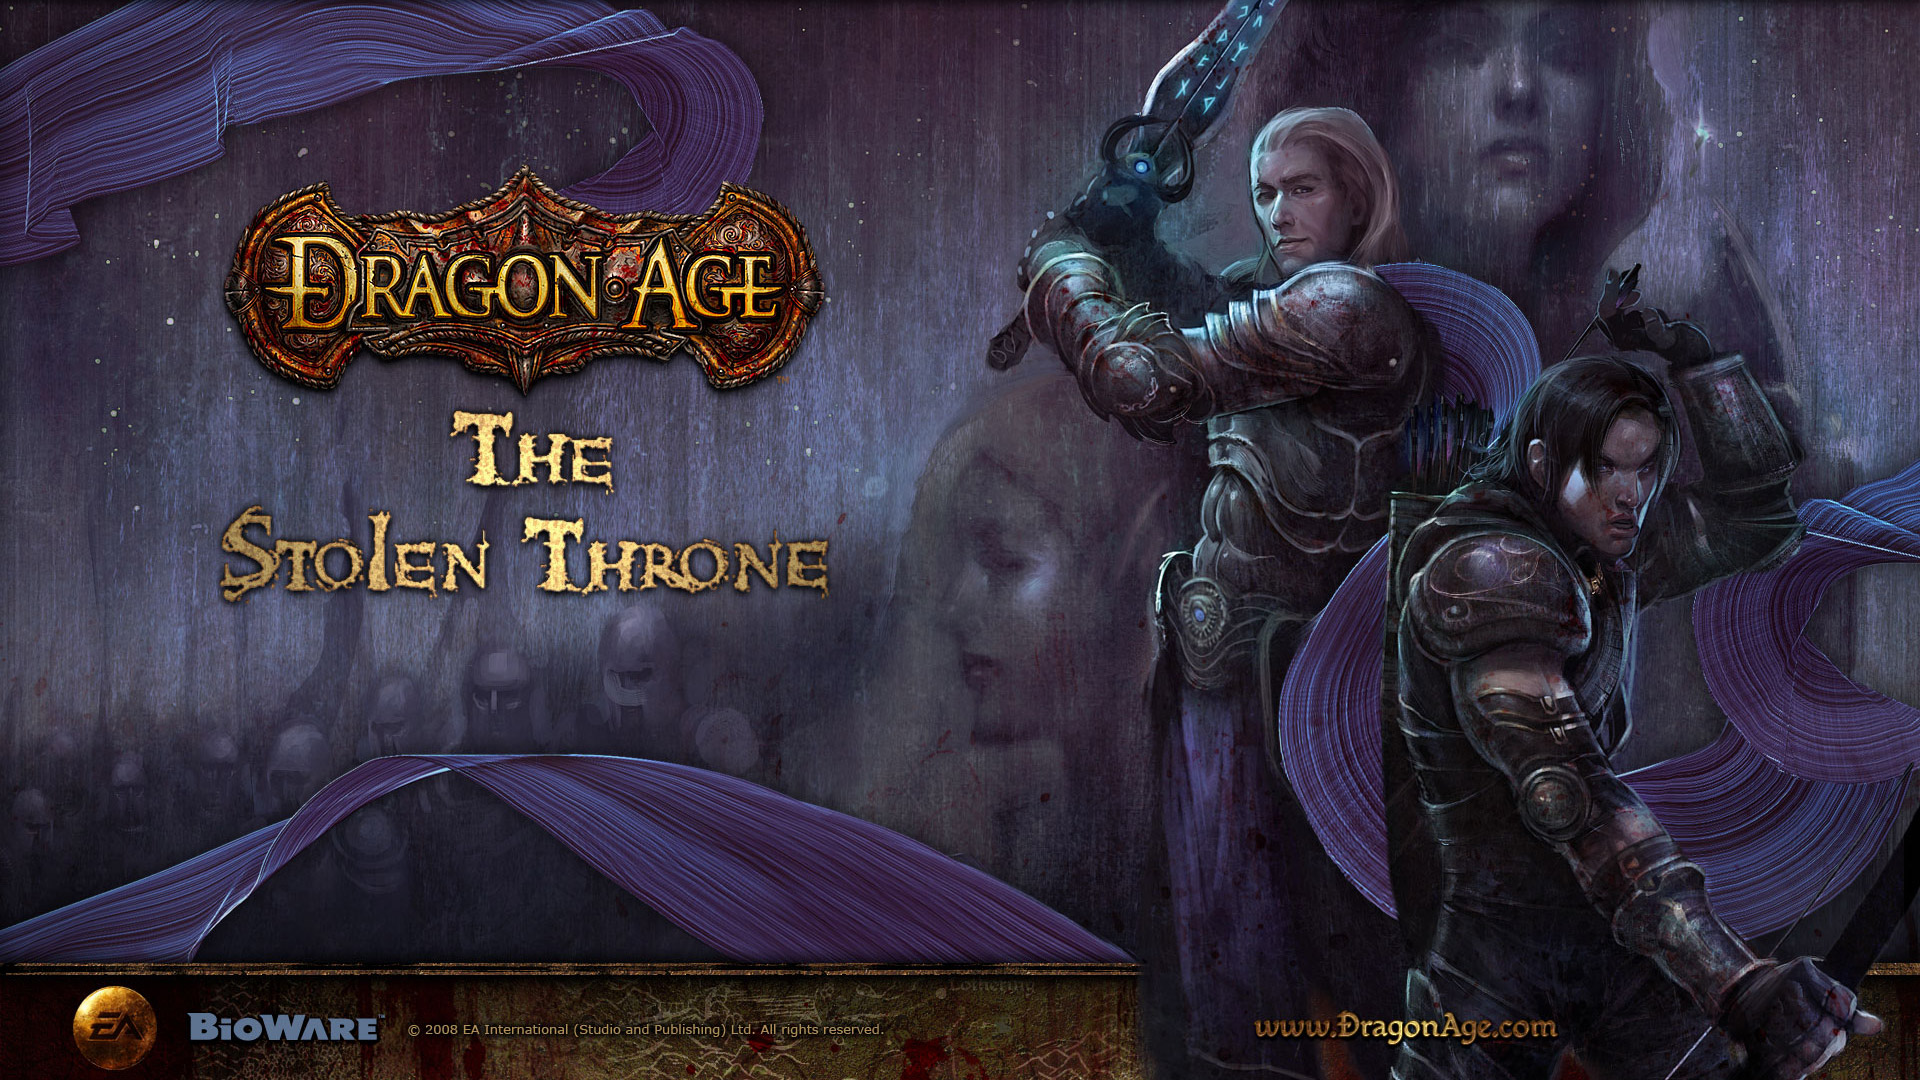 Free Dragon Age: Origins Wallpaper in 1920x1080